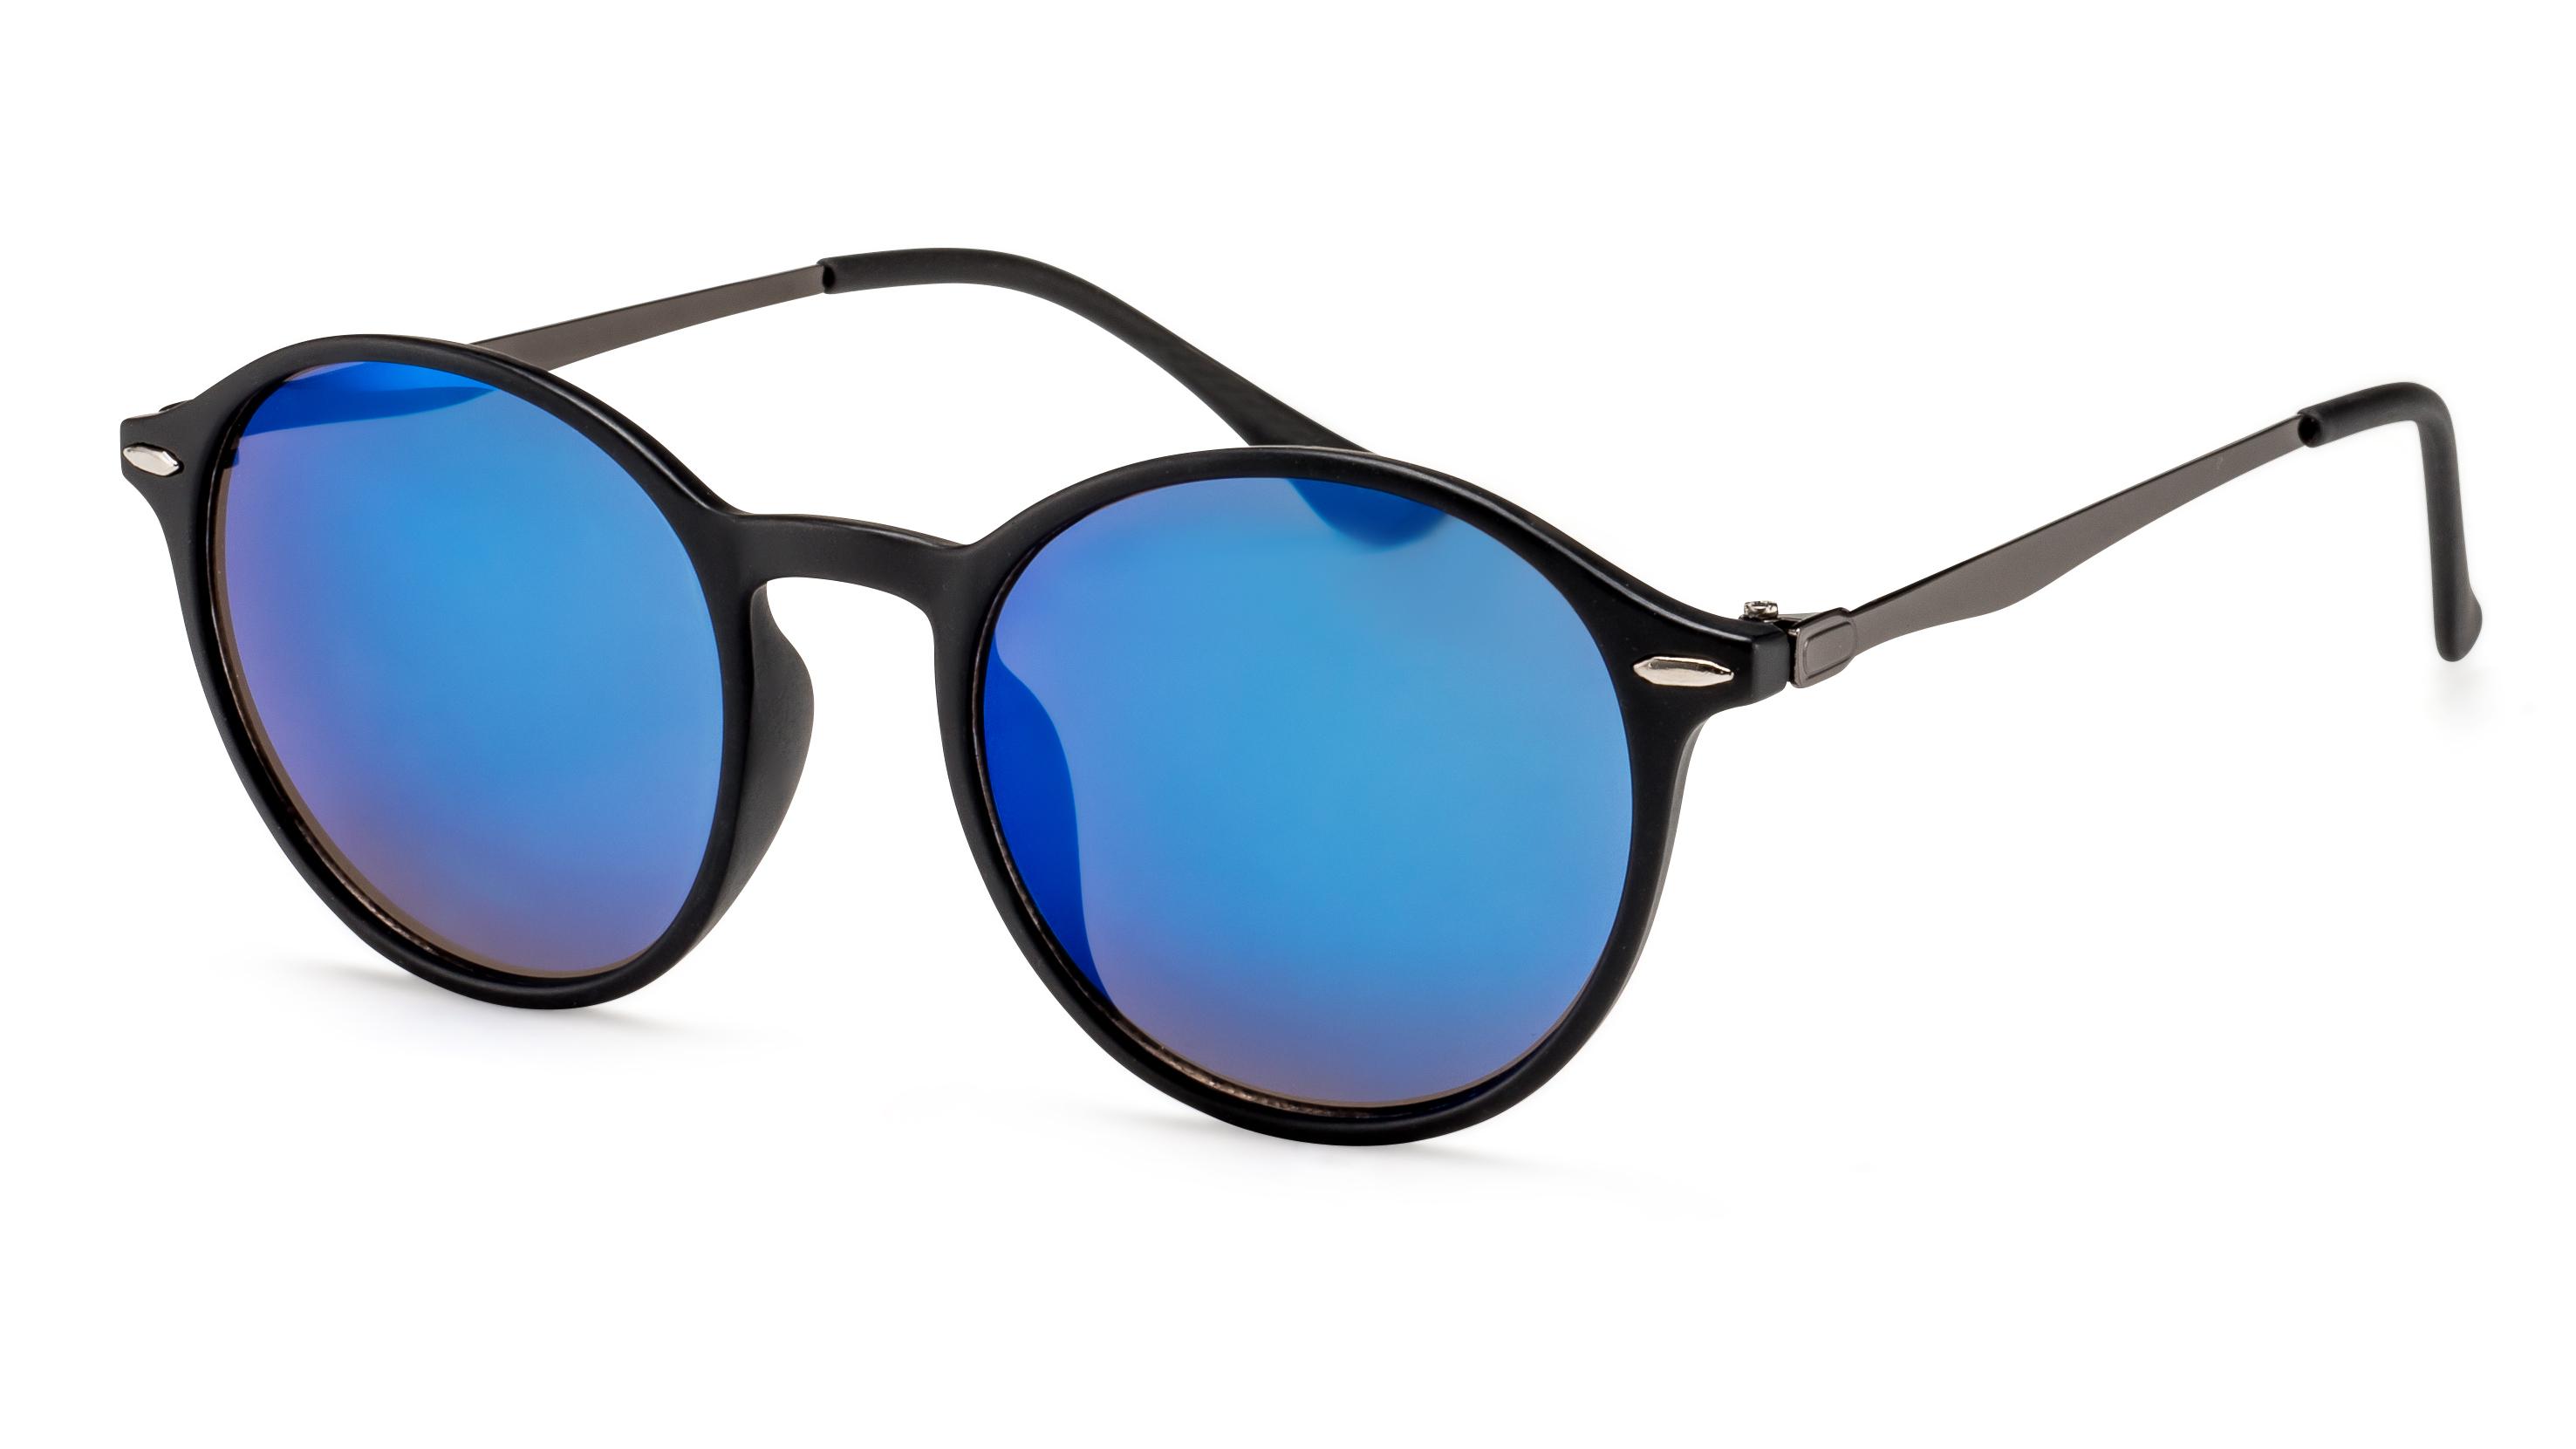 Main view sunglasses F3001099